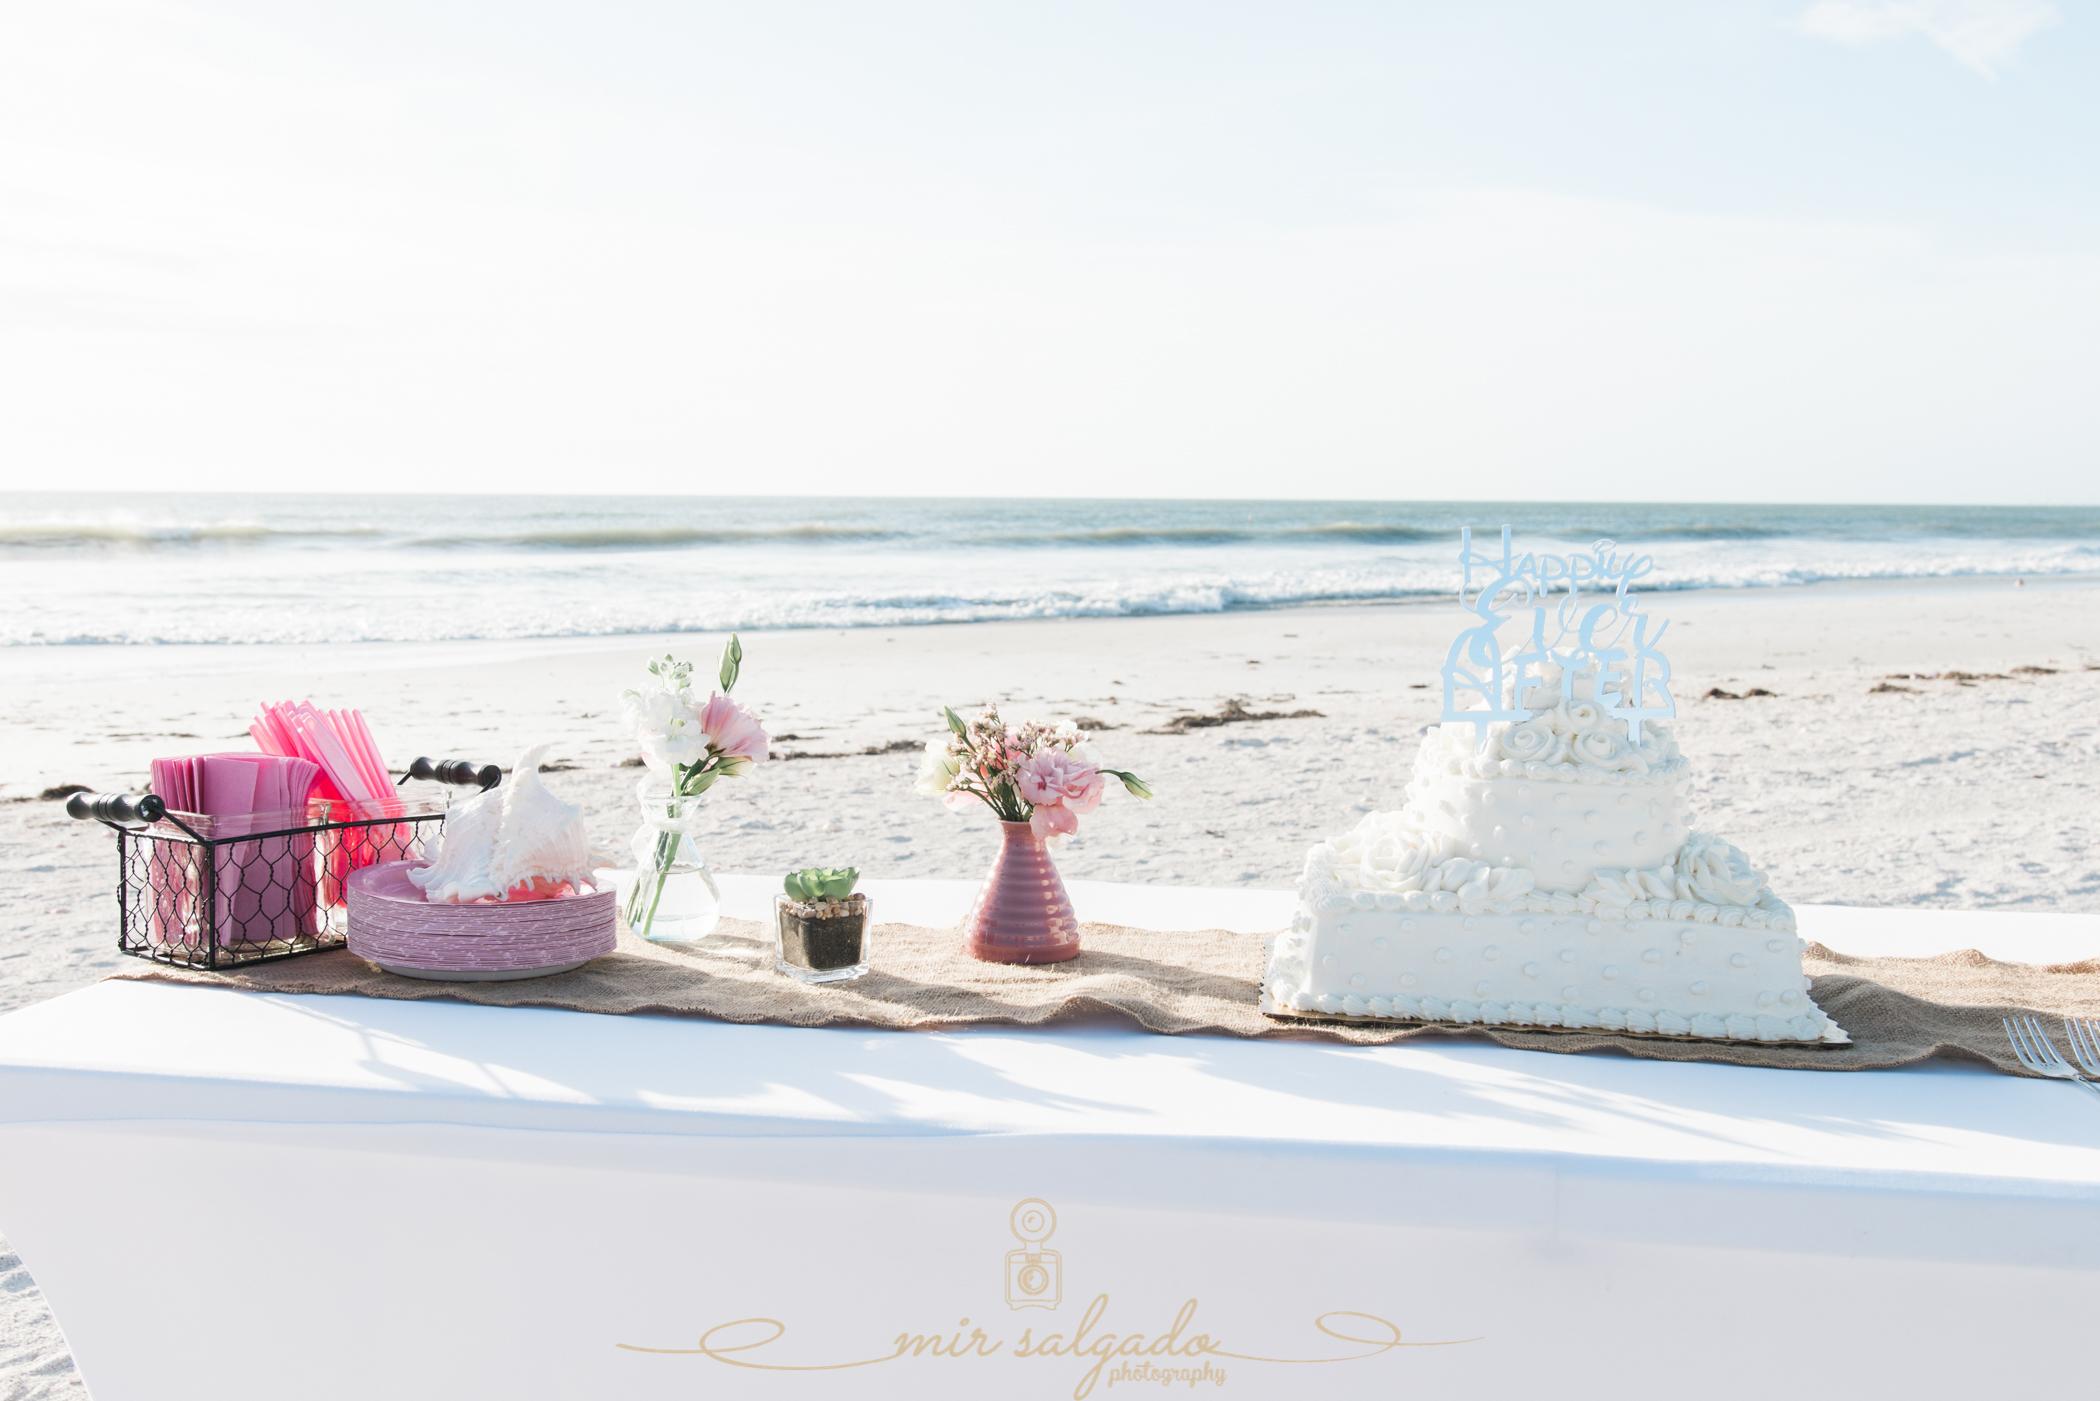 St.Pete-beach-wedding-cake-cutting, St.Pete-wedding-photo, wedding-cake